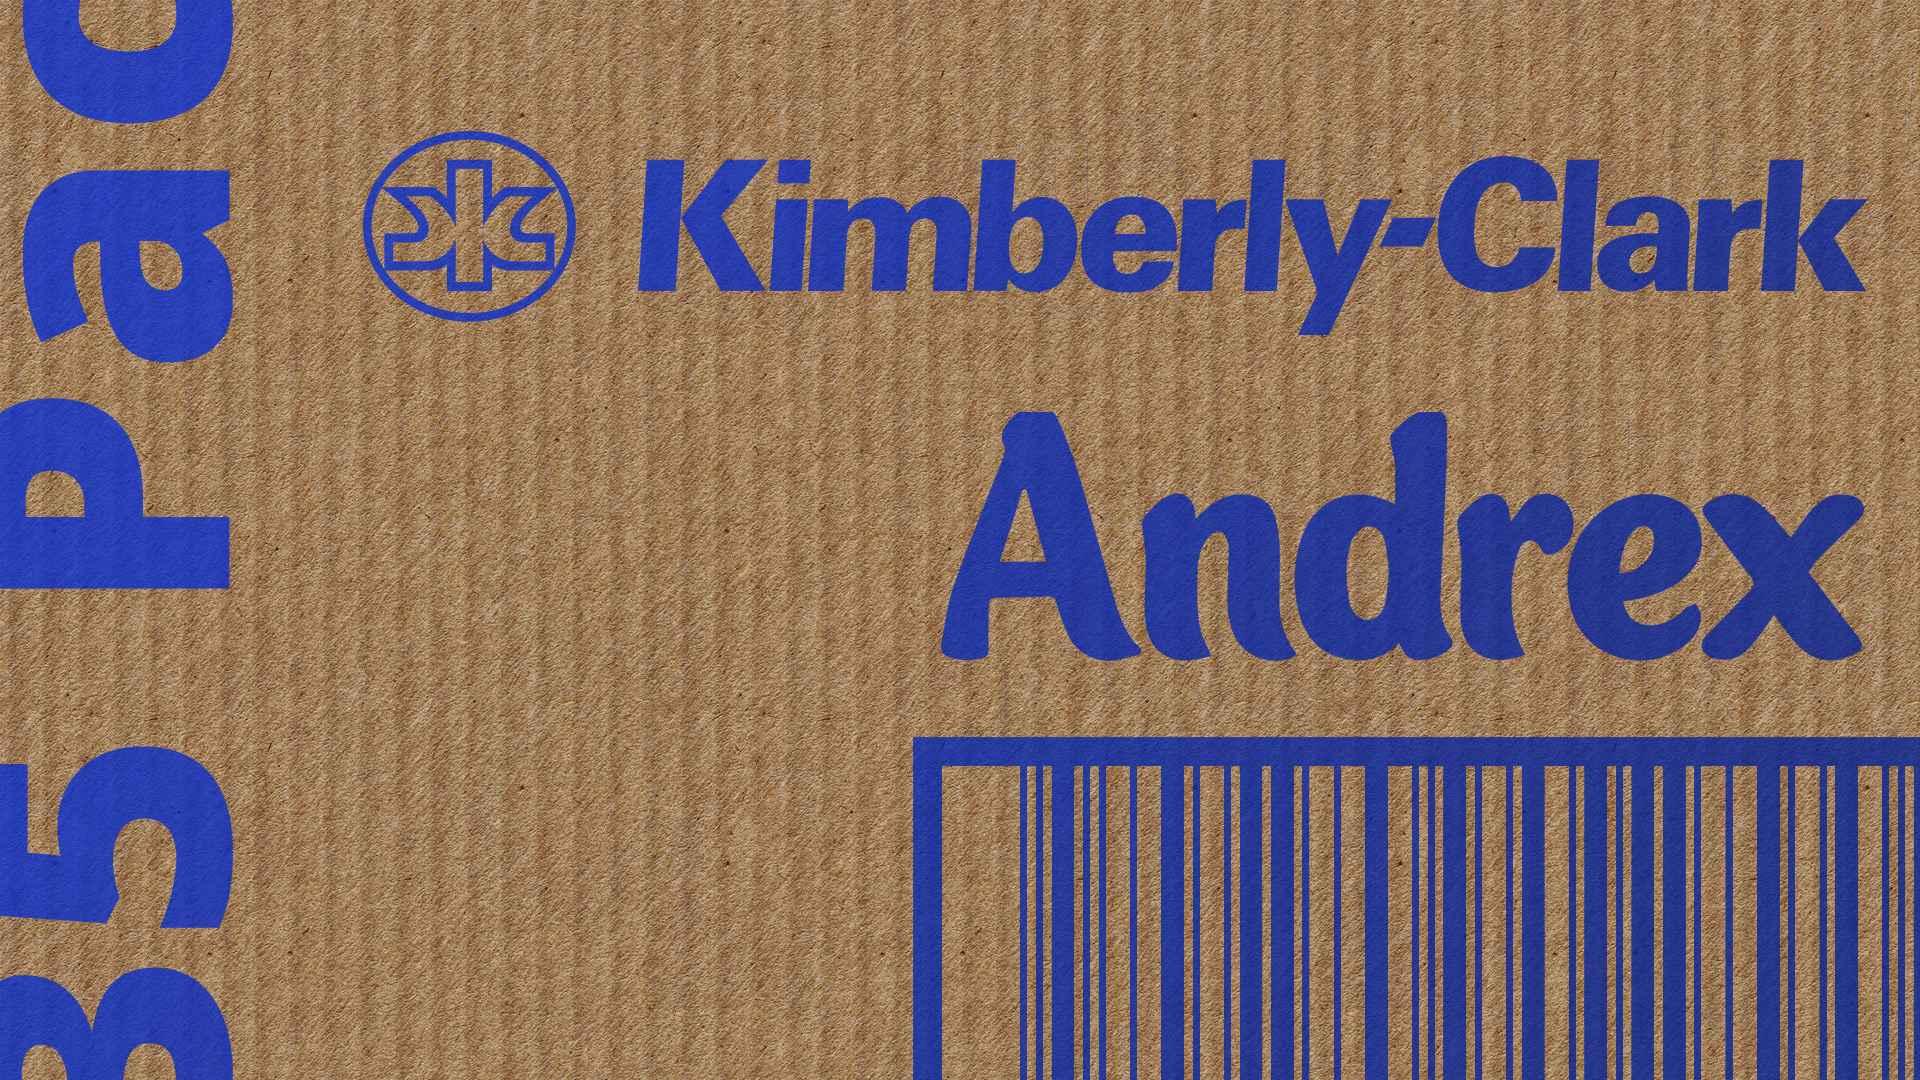 Kimberley Clark Pharma